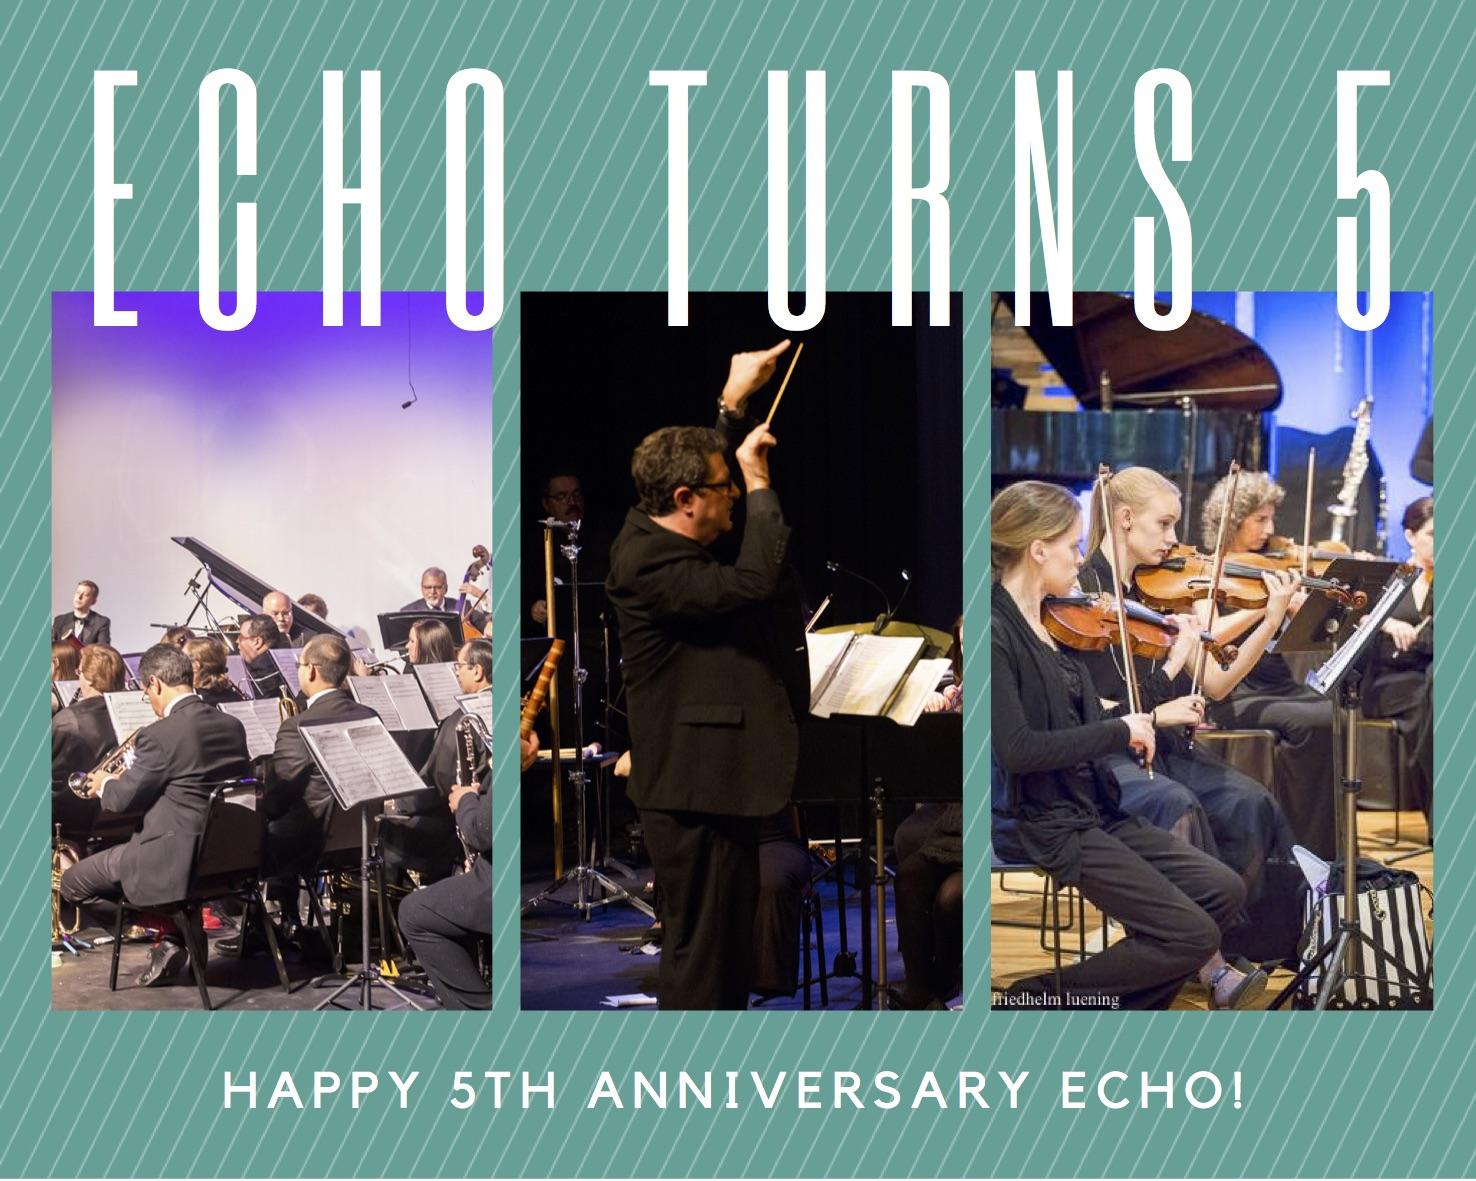 ECHO turns 5